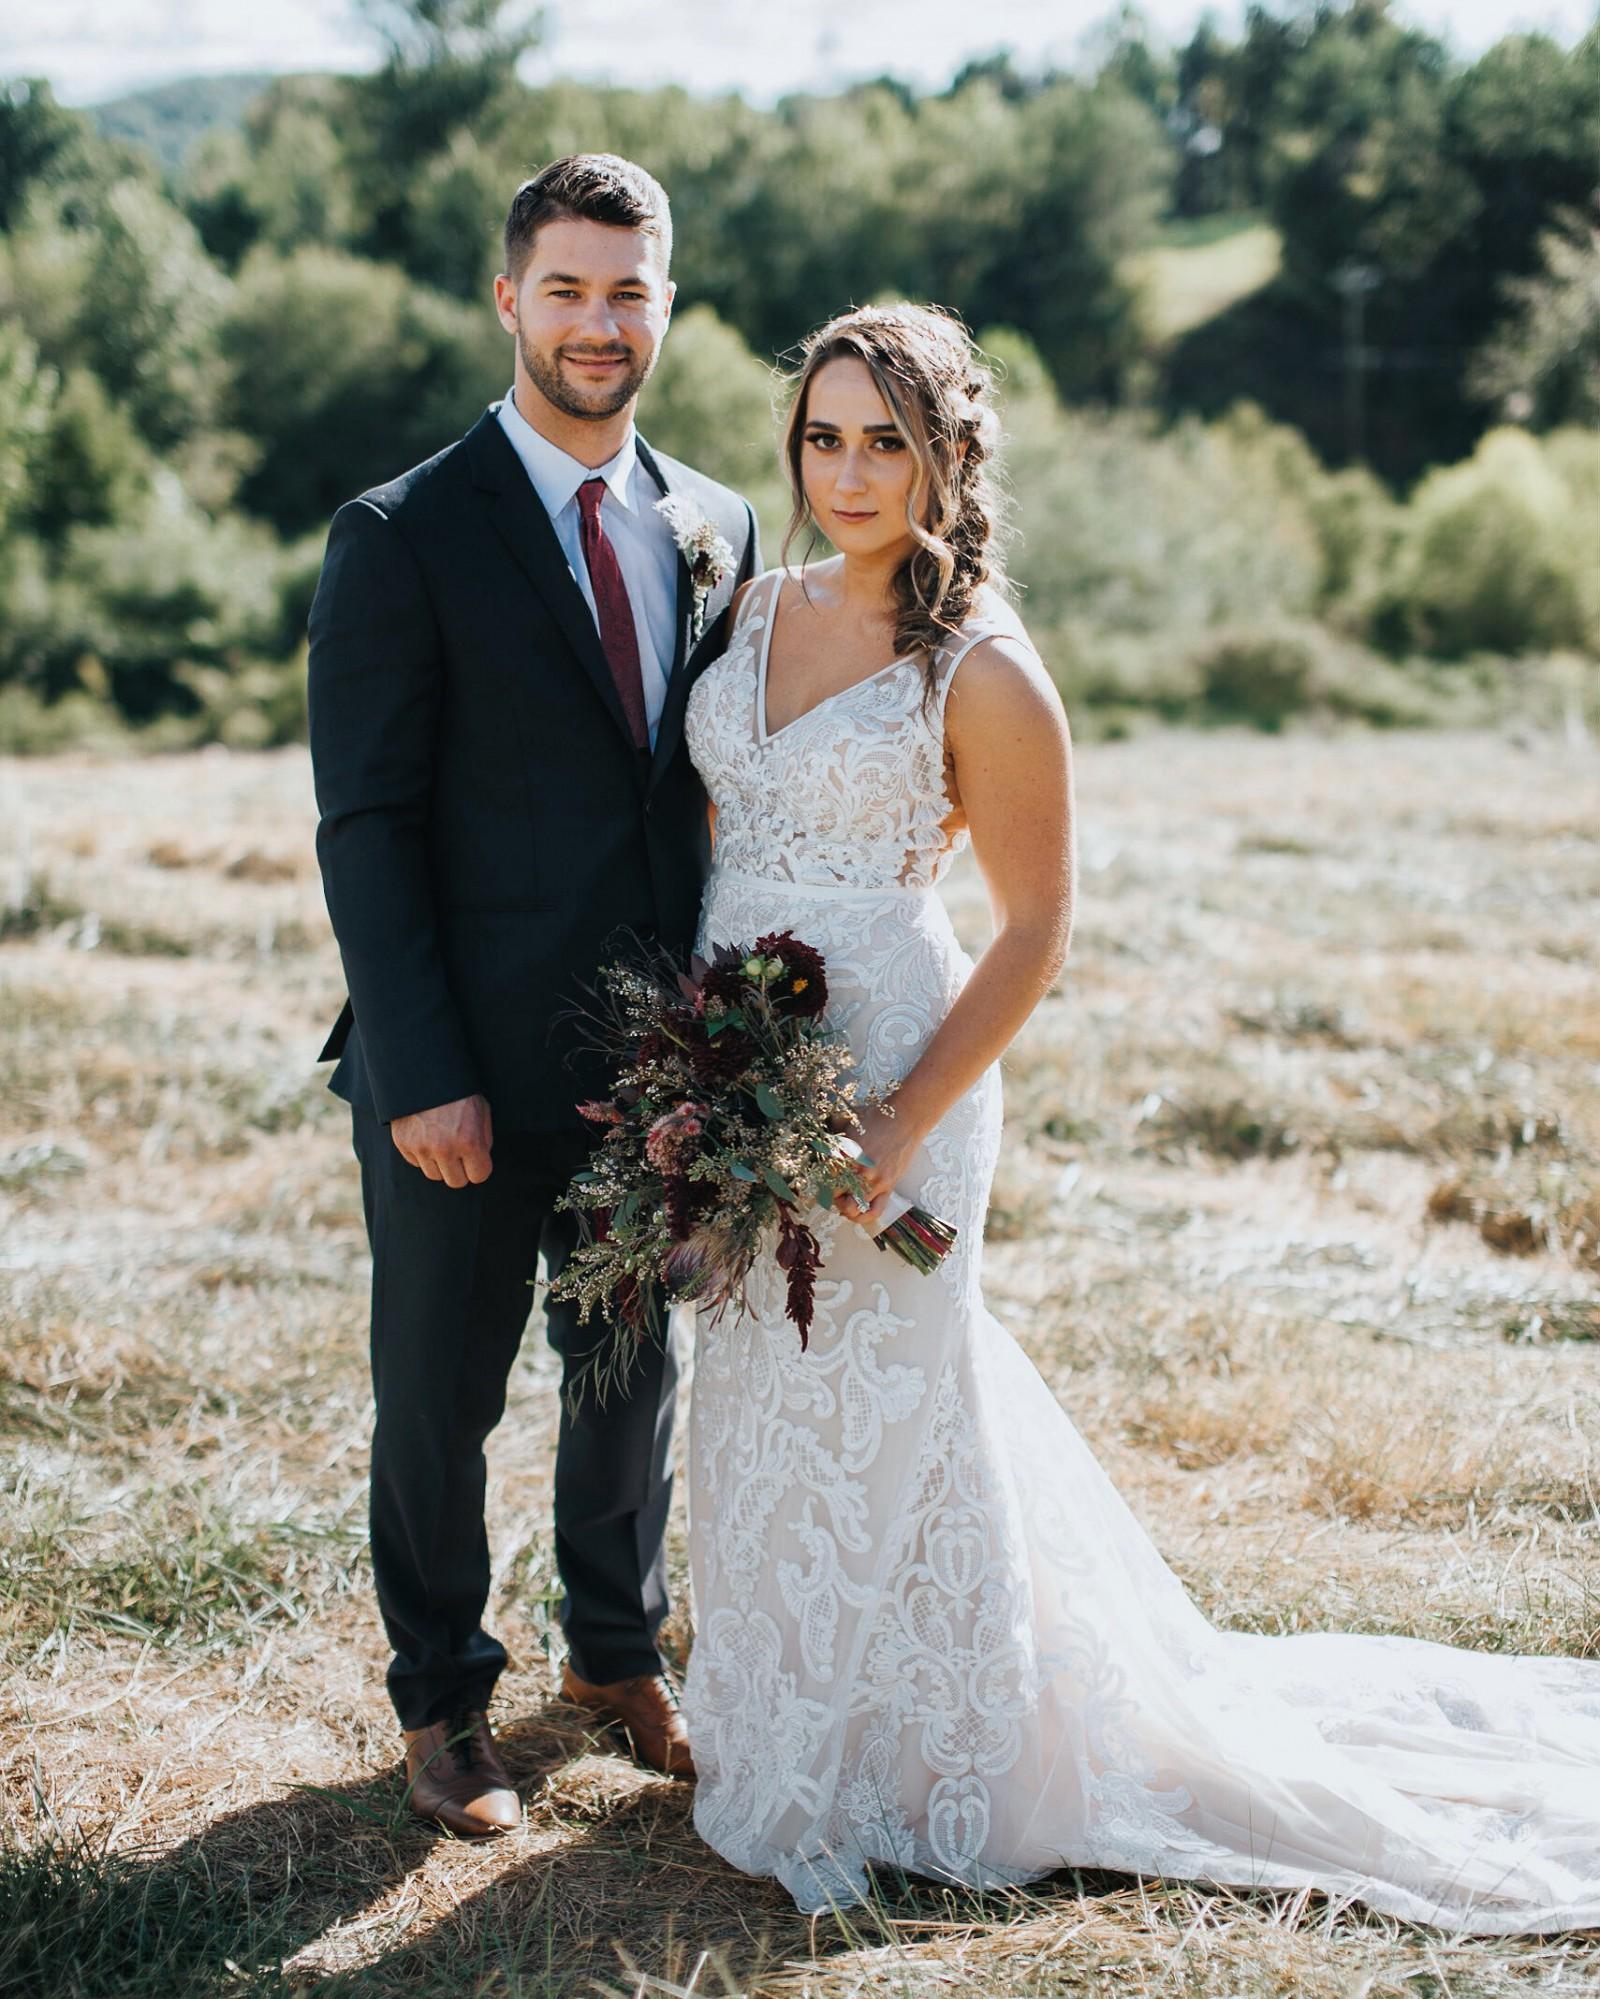 Essense Of Australia D2472 Preowned Wedding Dress On Sale